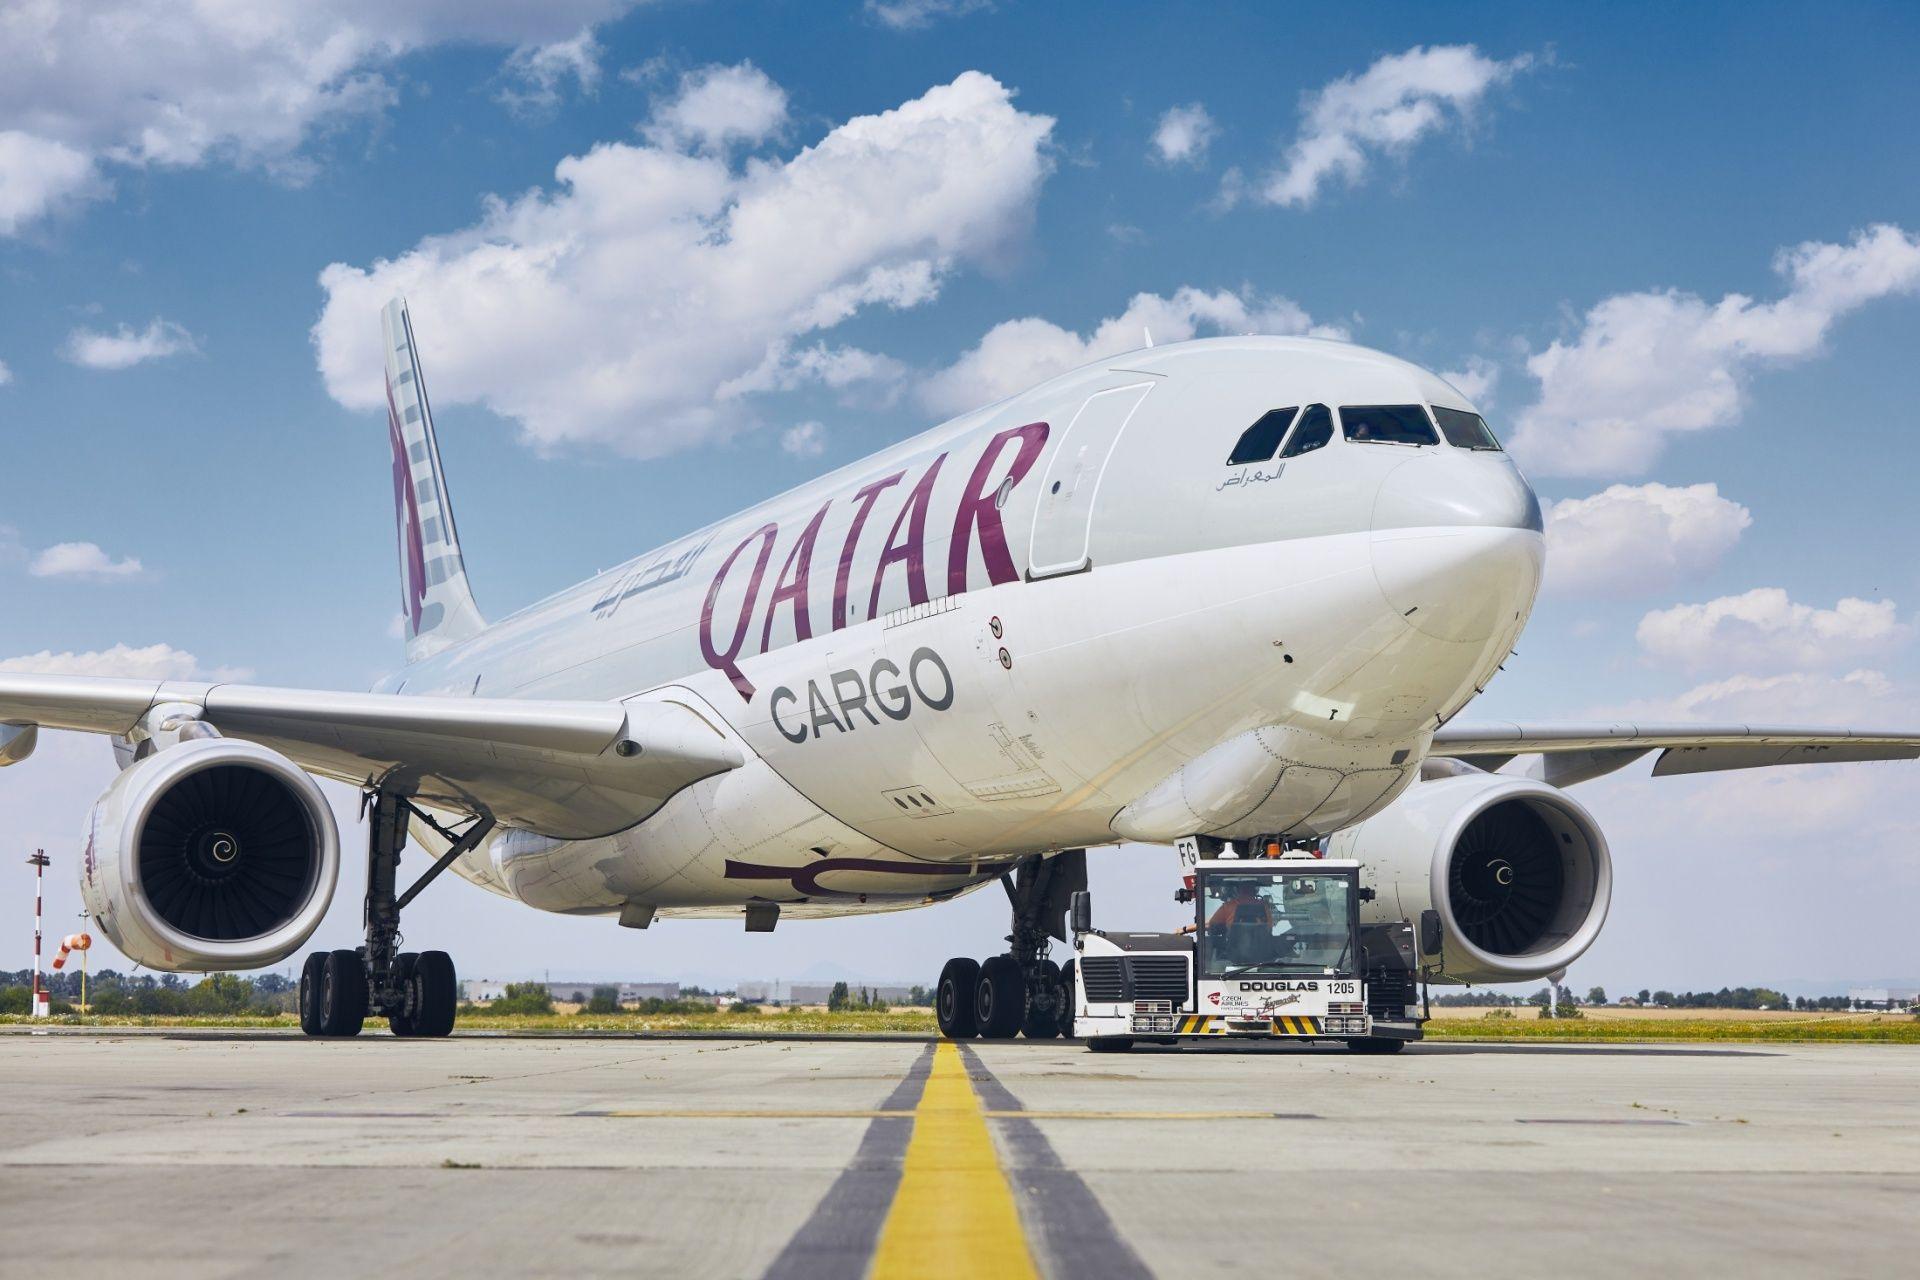 Nákladní letadlo Qatar Cargo. Pramen: Letiště Praha